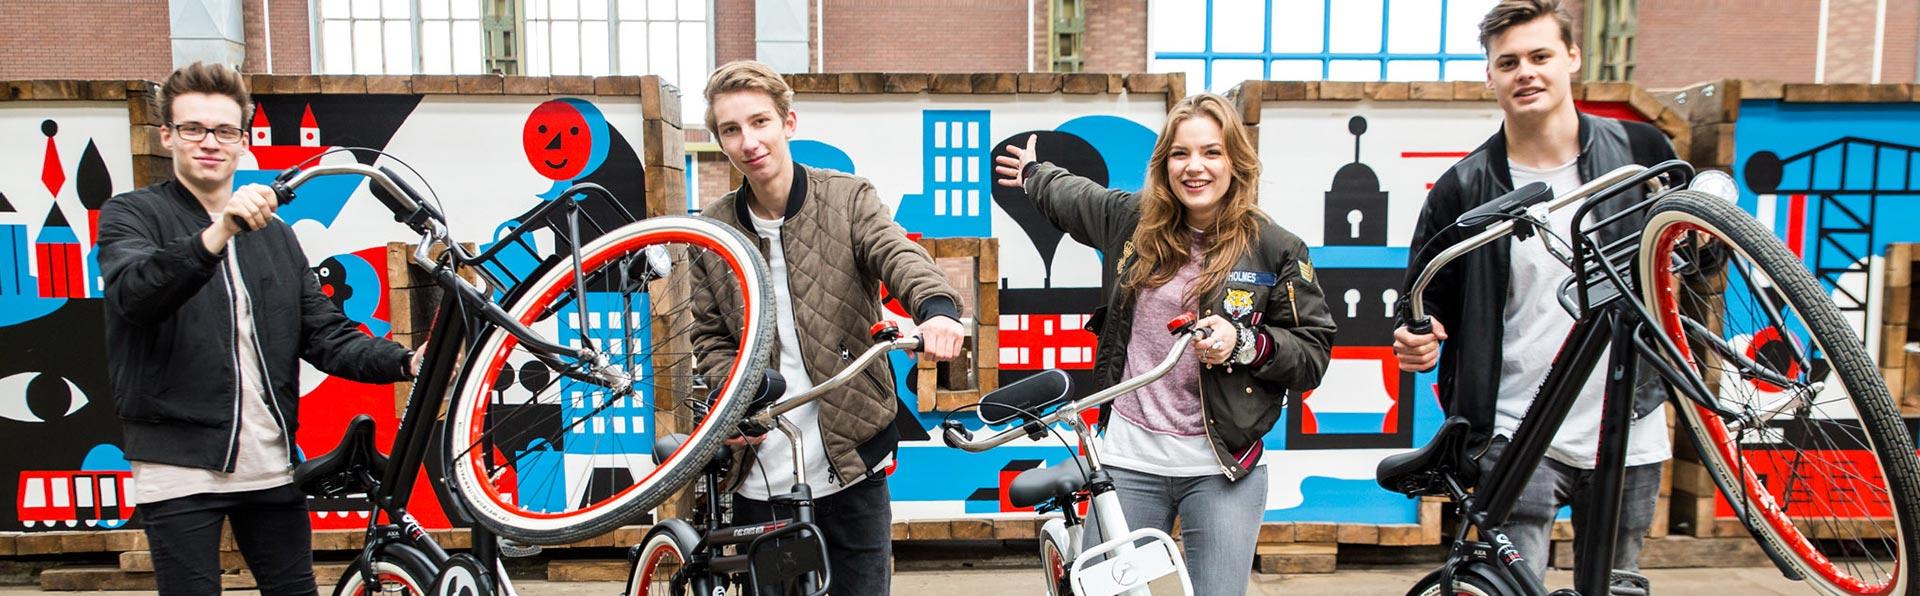 Spinnin' High School Takeover - Bike Tricks